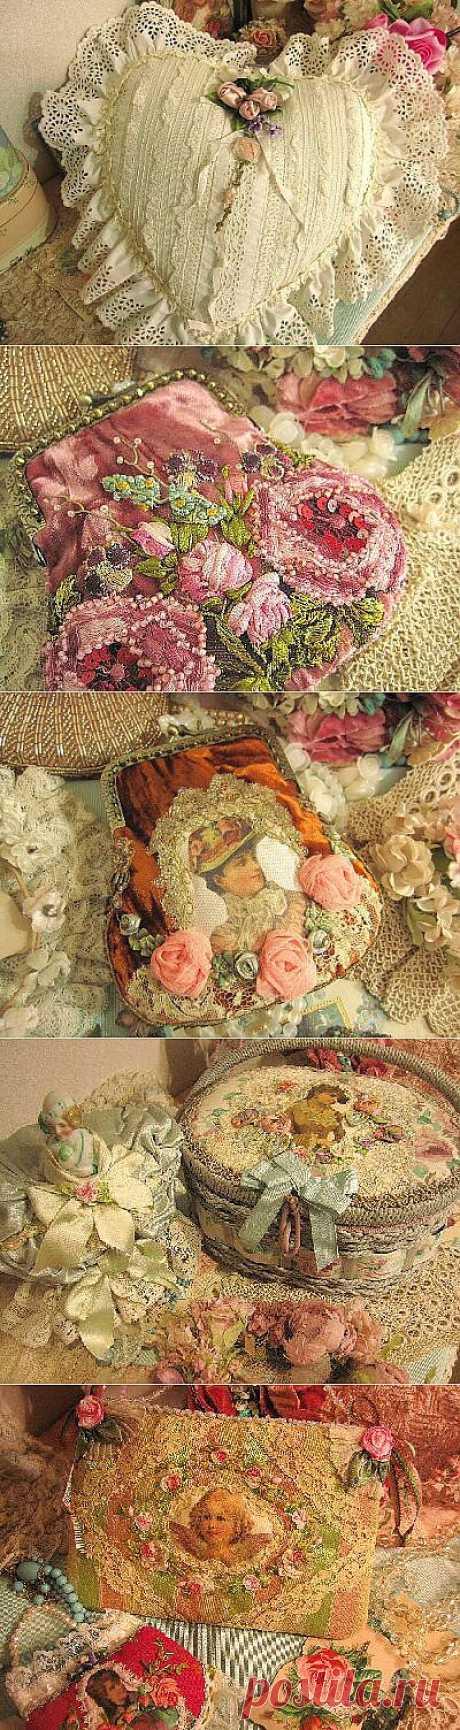 Los encajes vintazhnye de la maestra Pastel japonesa.